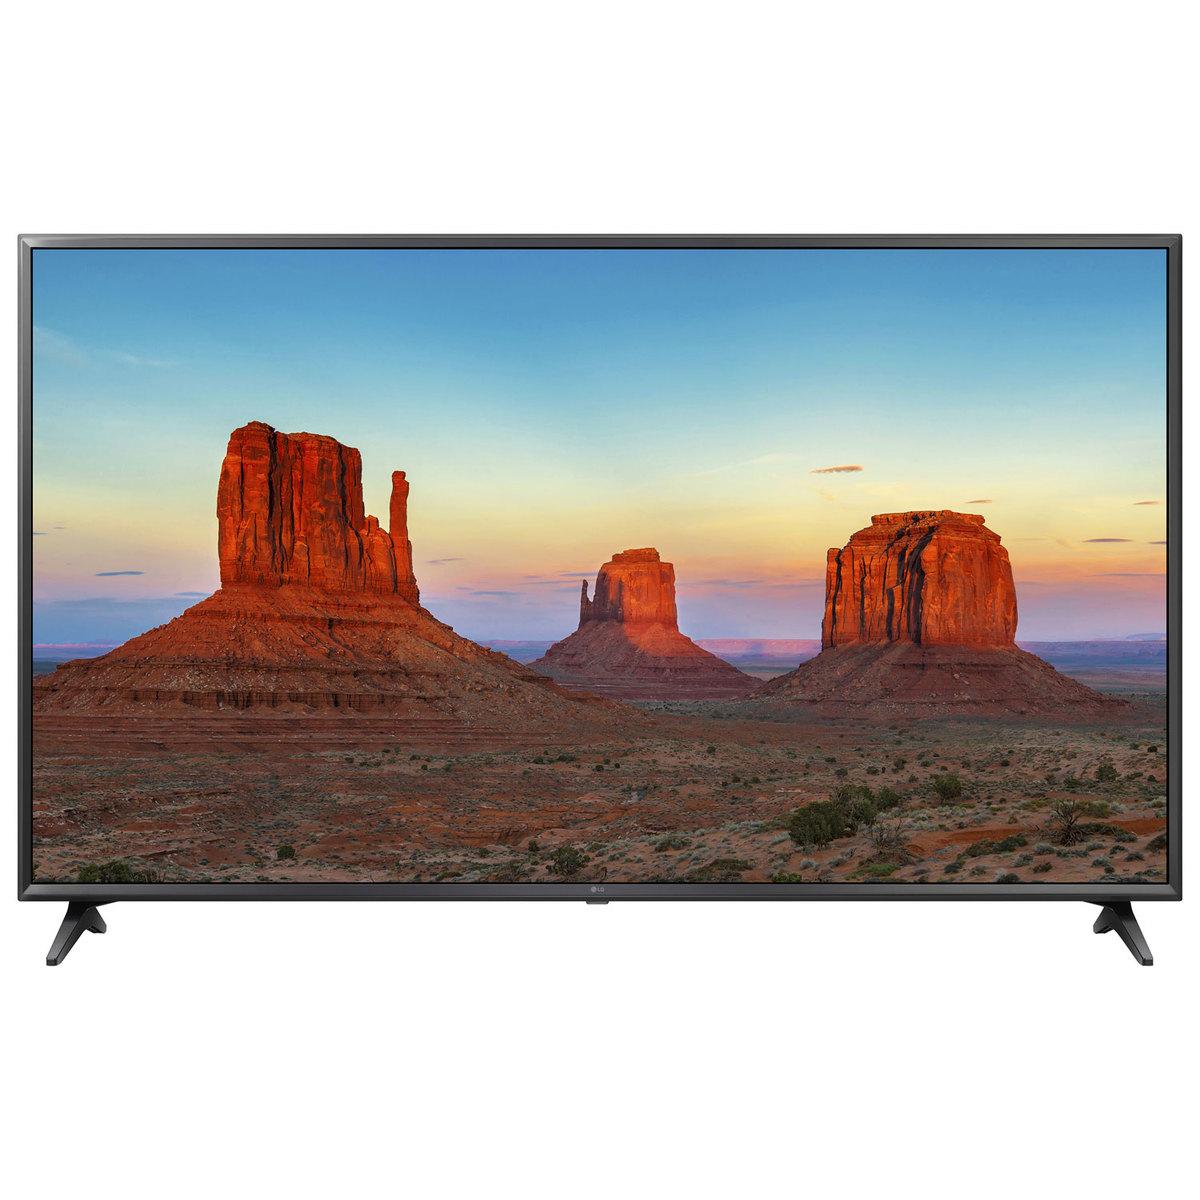 טלוויזיה LG 43UK6300Y 4K 43 אינטש